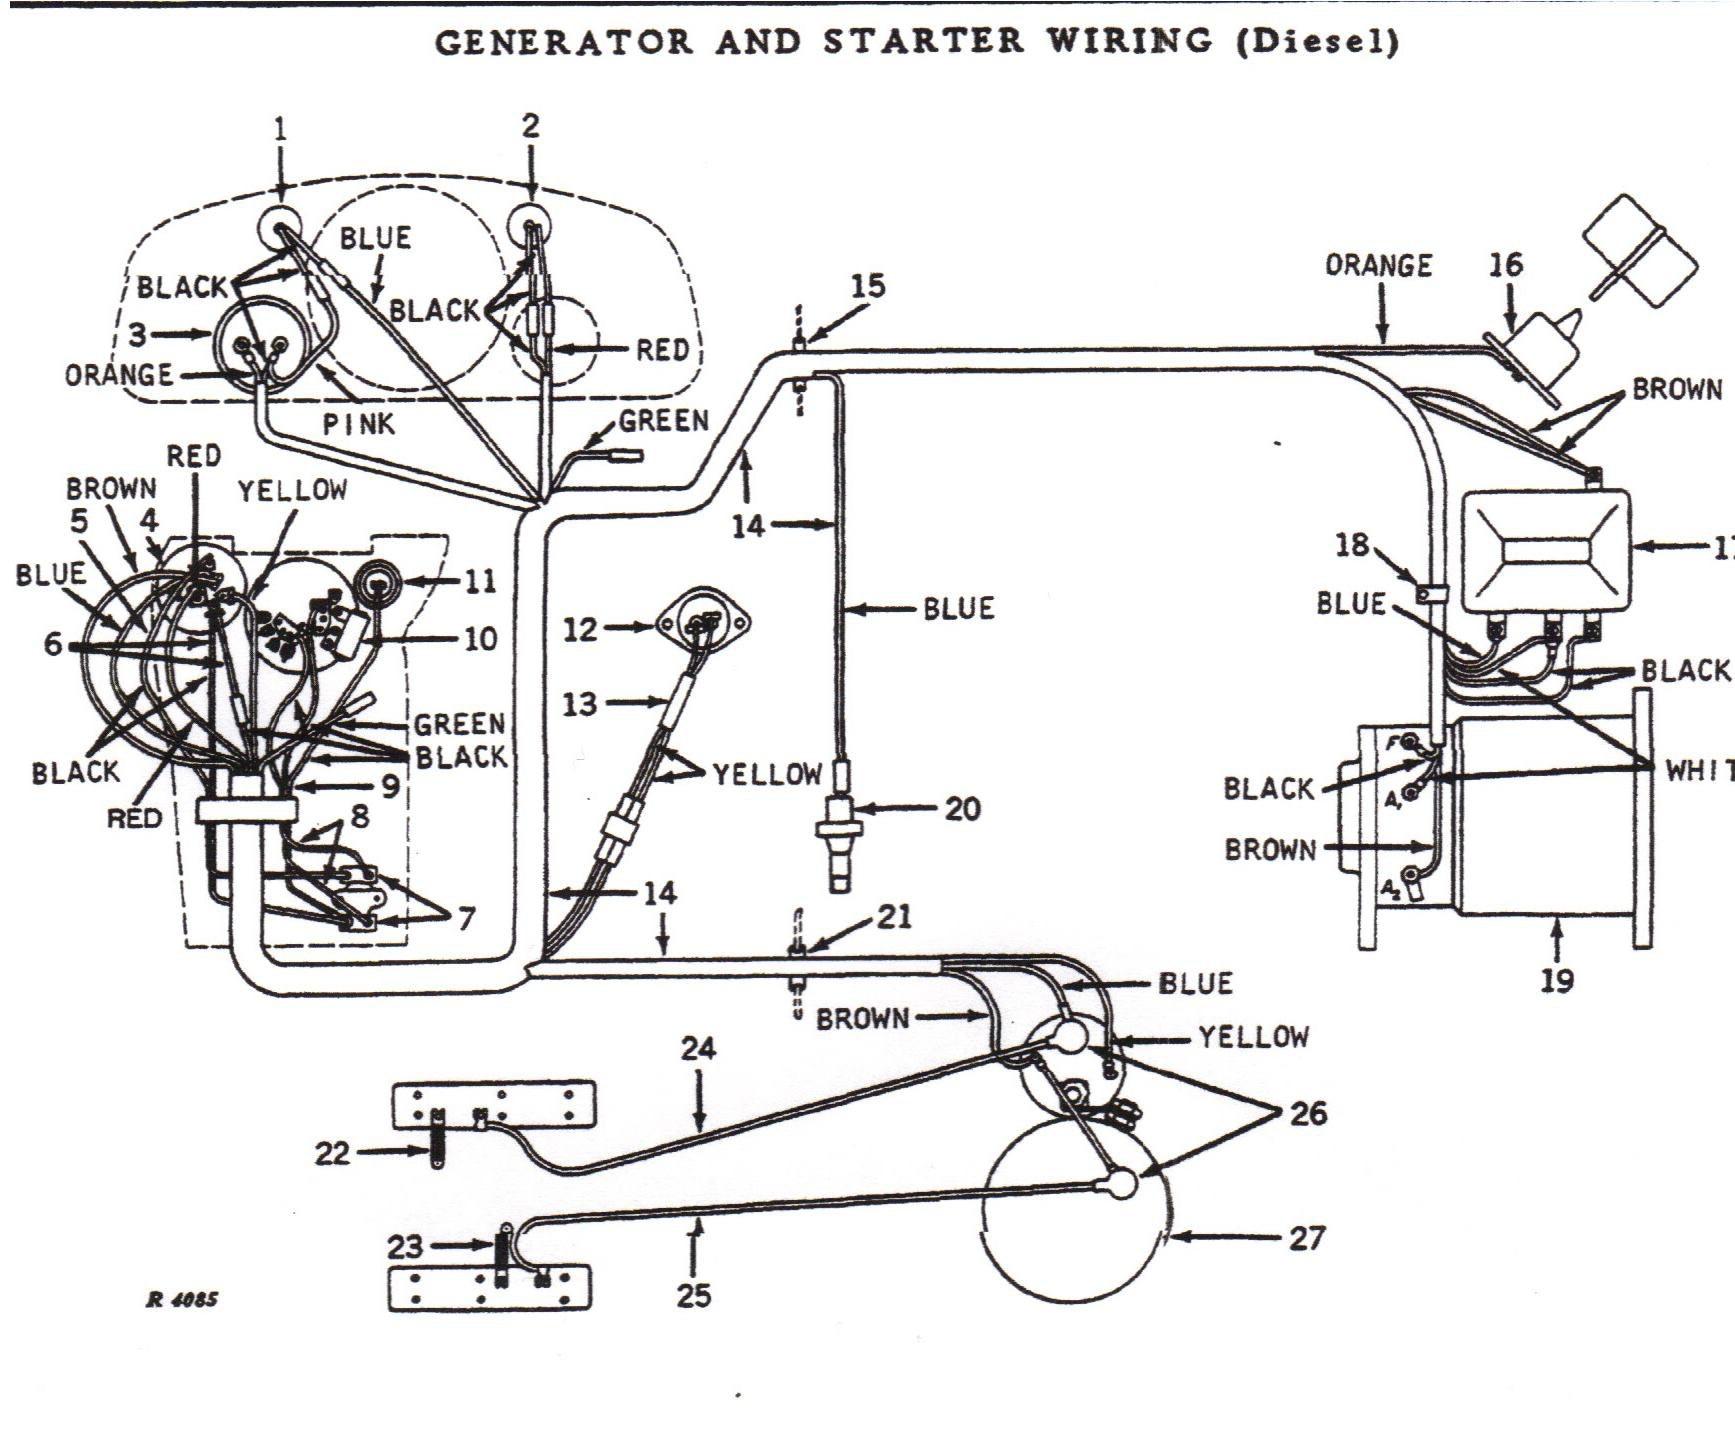 Car Starter Parts Diagram Stx 38 Wiring Diagram Wiring Diagram Of Car Starter Parts Diagram